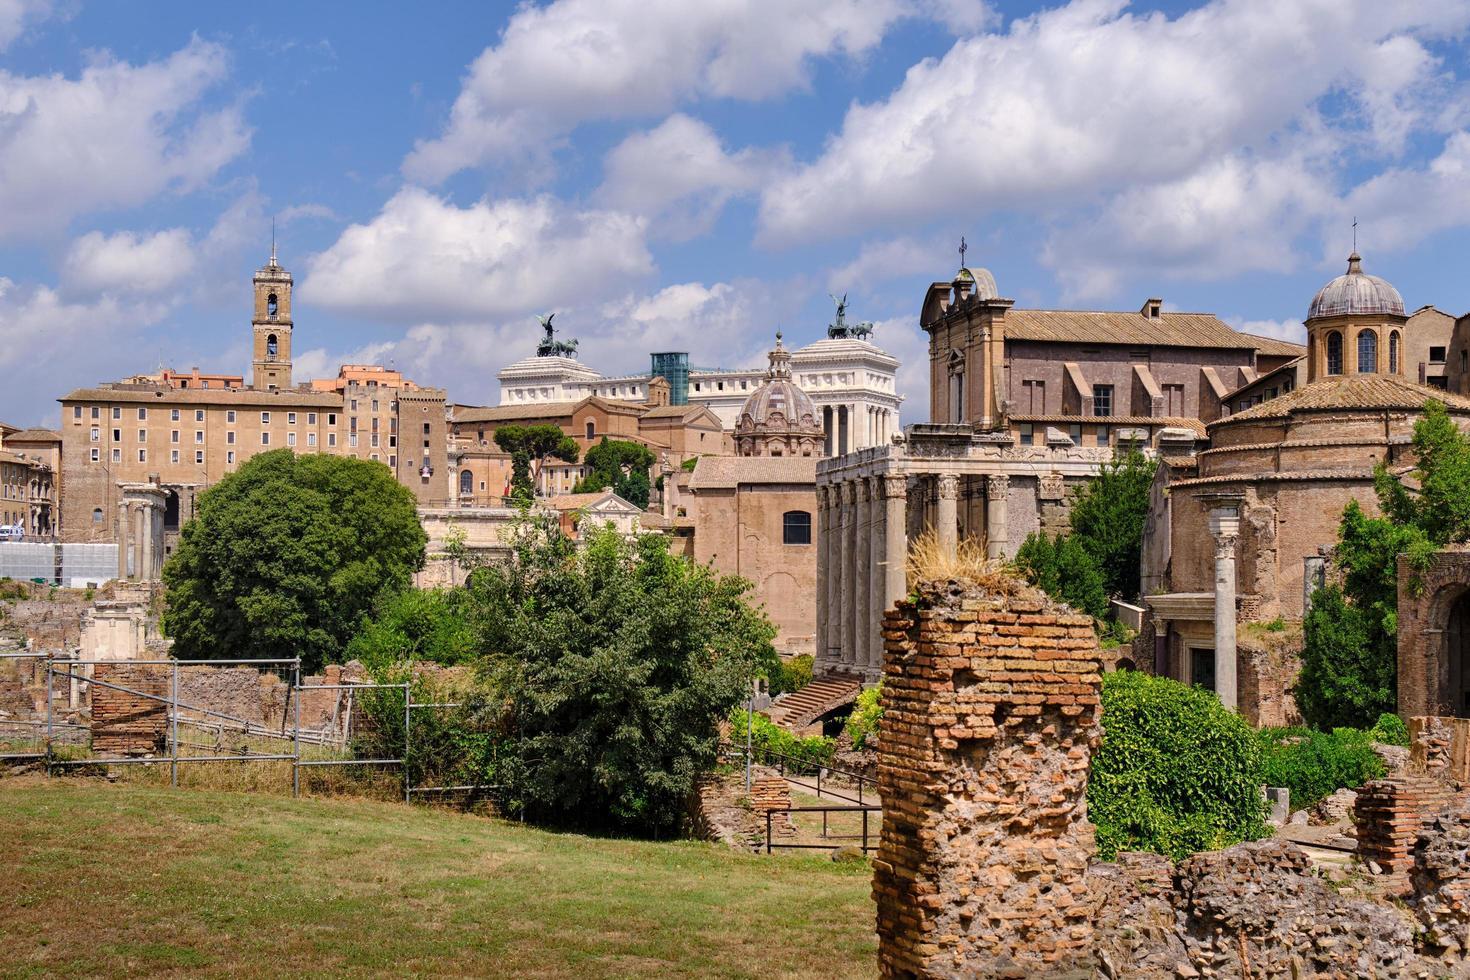 kejserliga forum i antika Rom foto